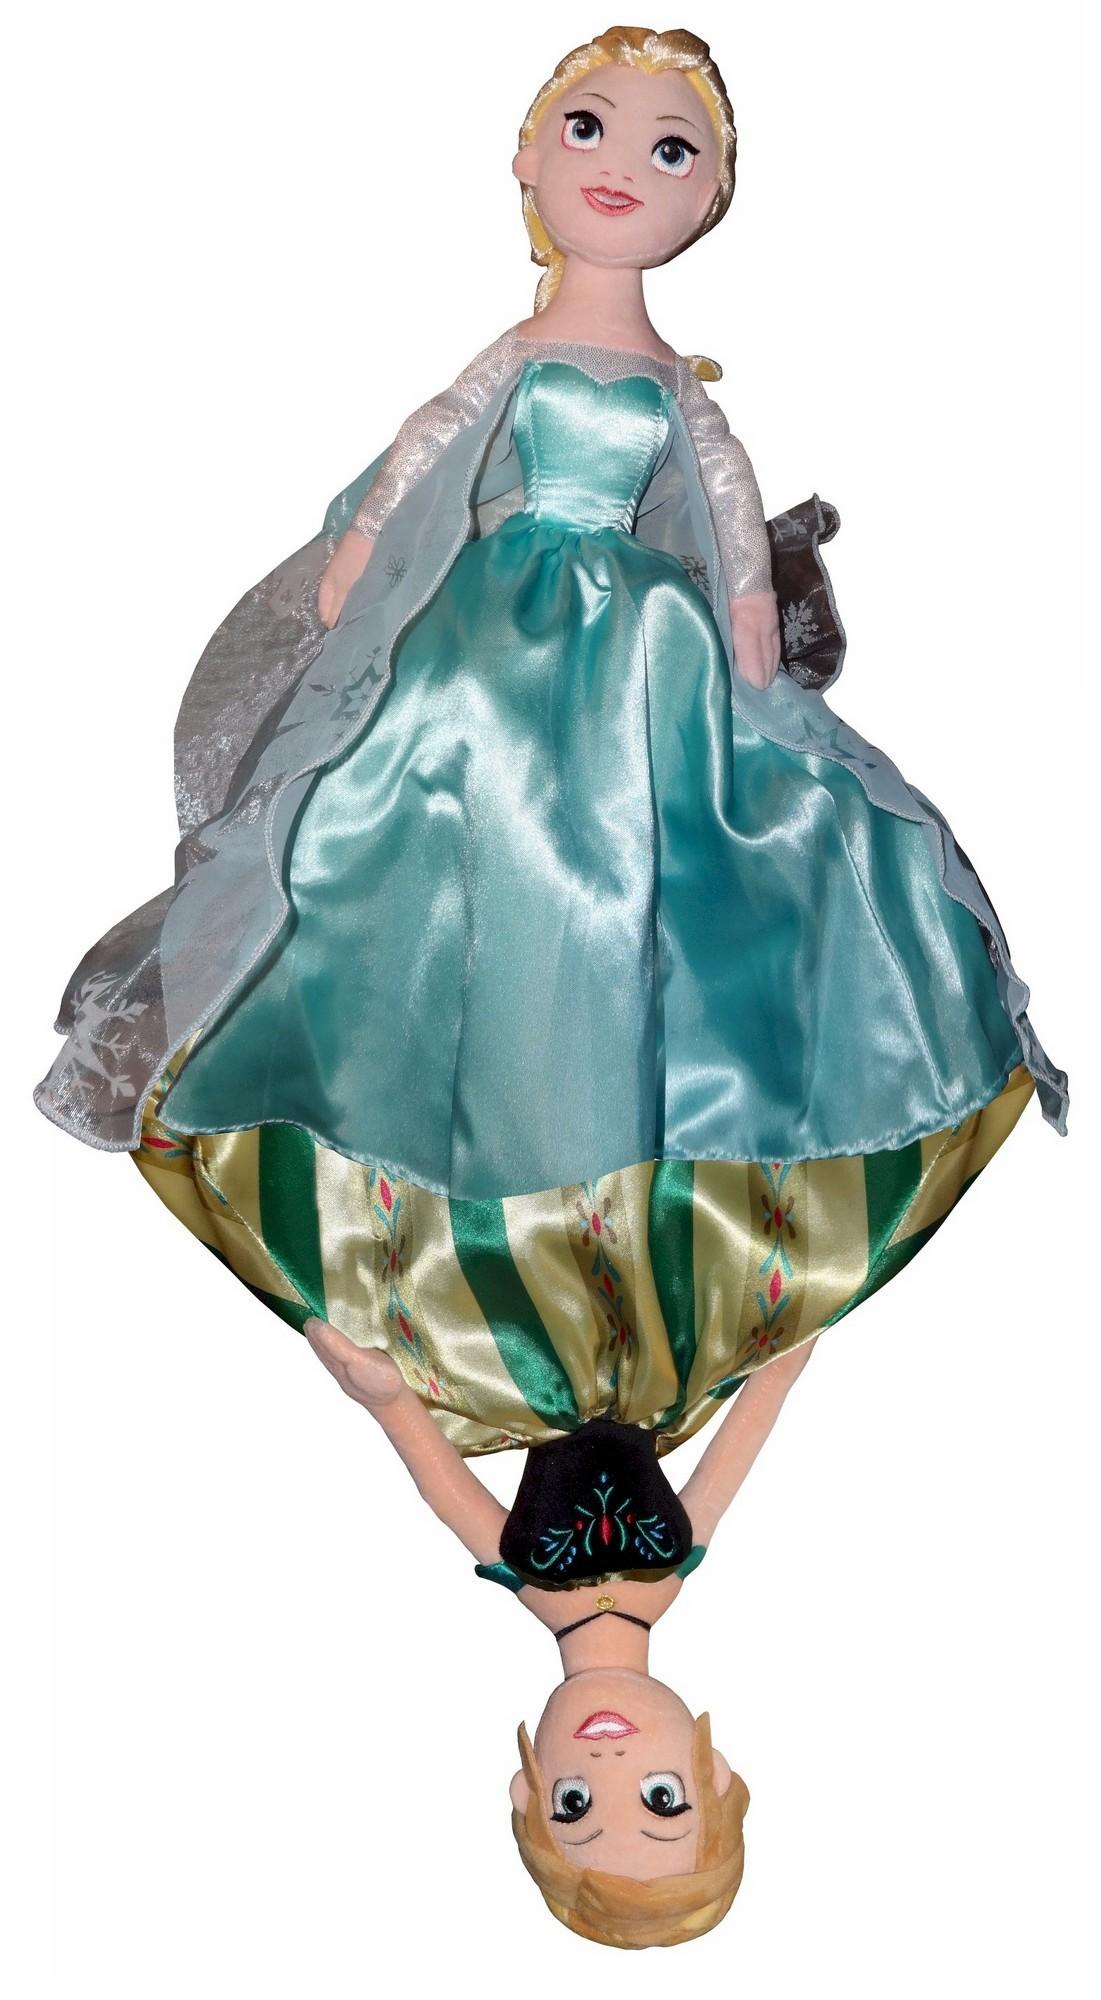 Disney Frozen 14 Inch Anna & Elsa Topsy Turvy Plush Doll © Dizdude.com